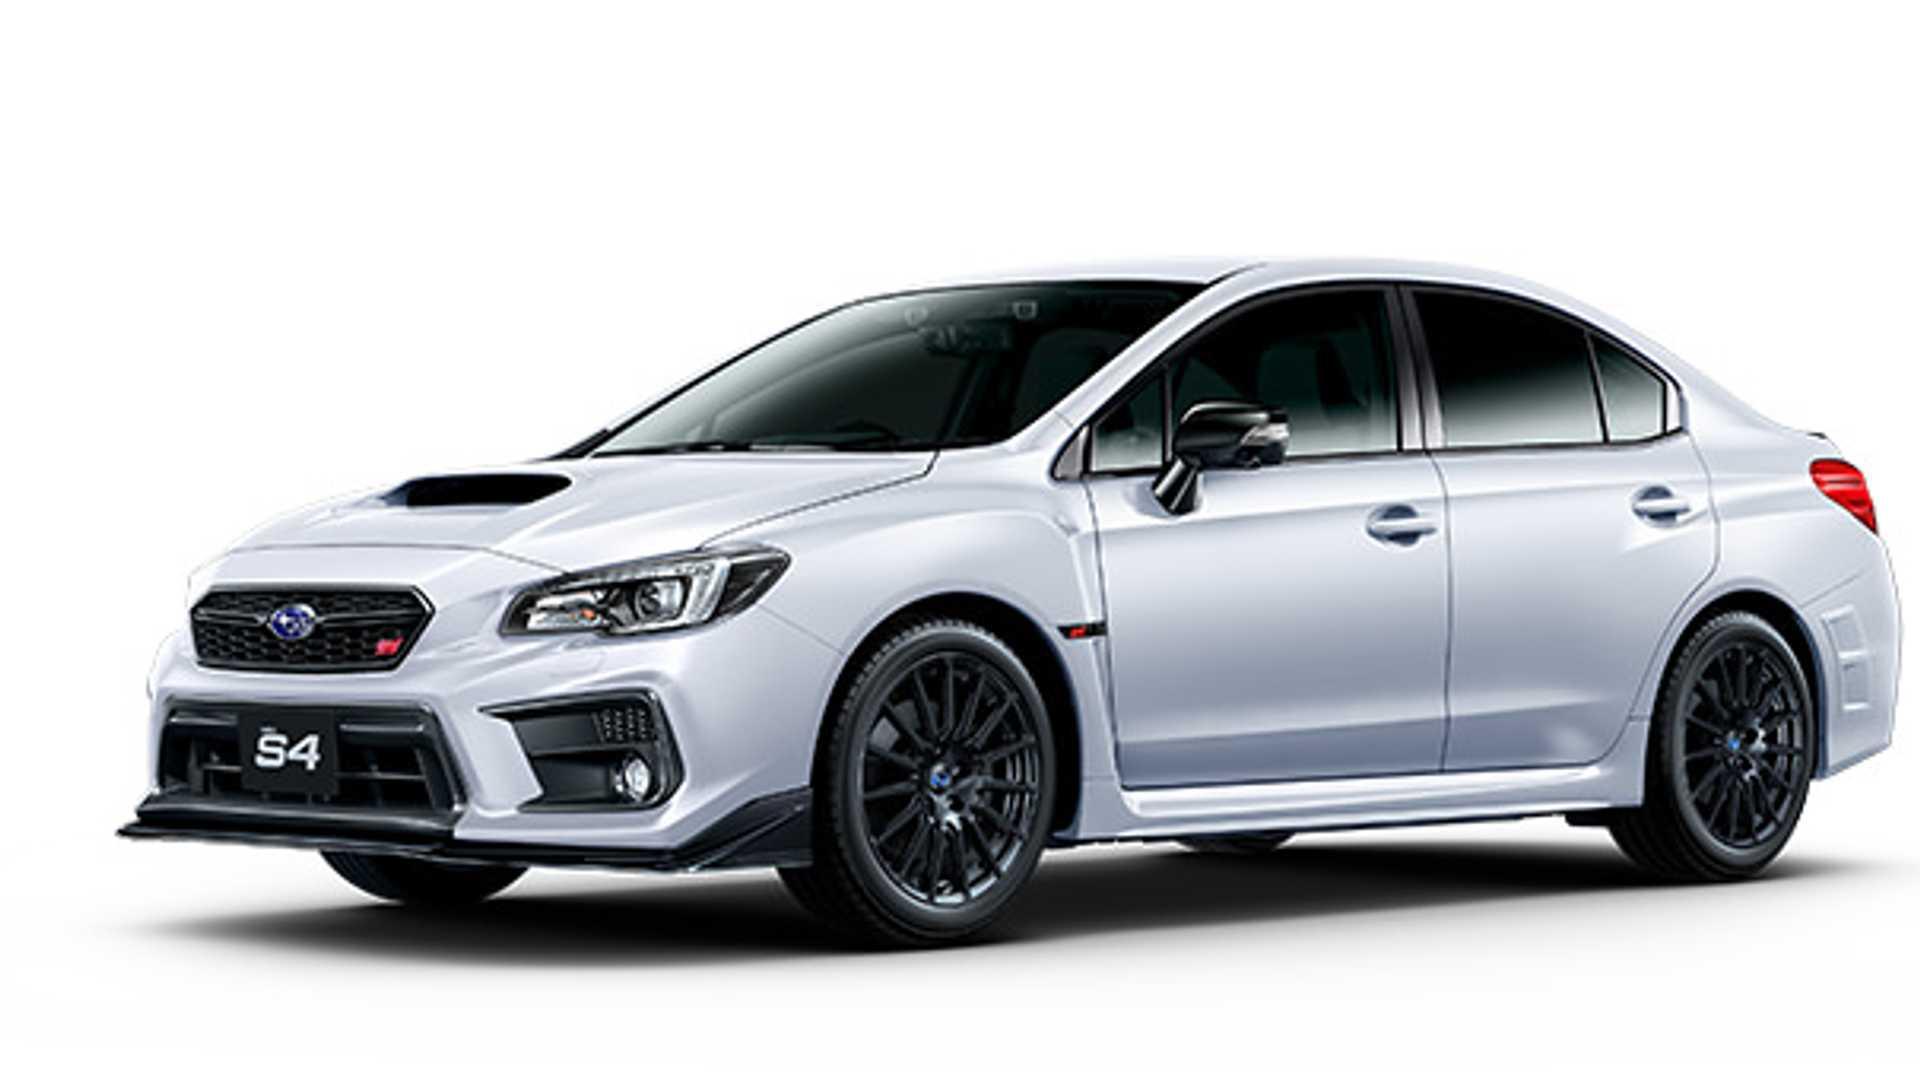 Subaru-WRX-S4-STI-Sport-Sharp-2